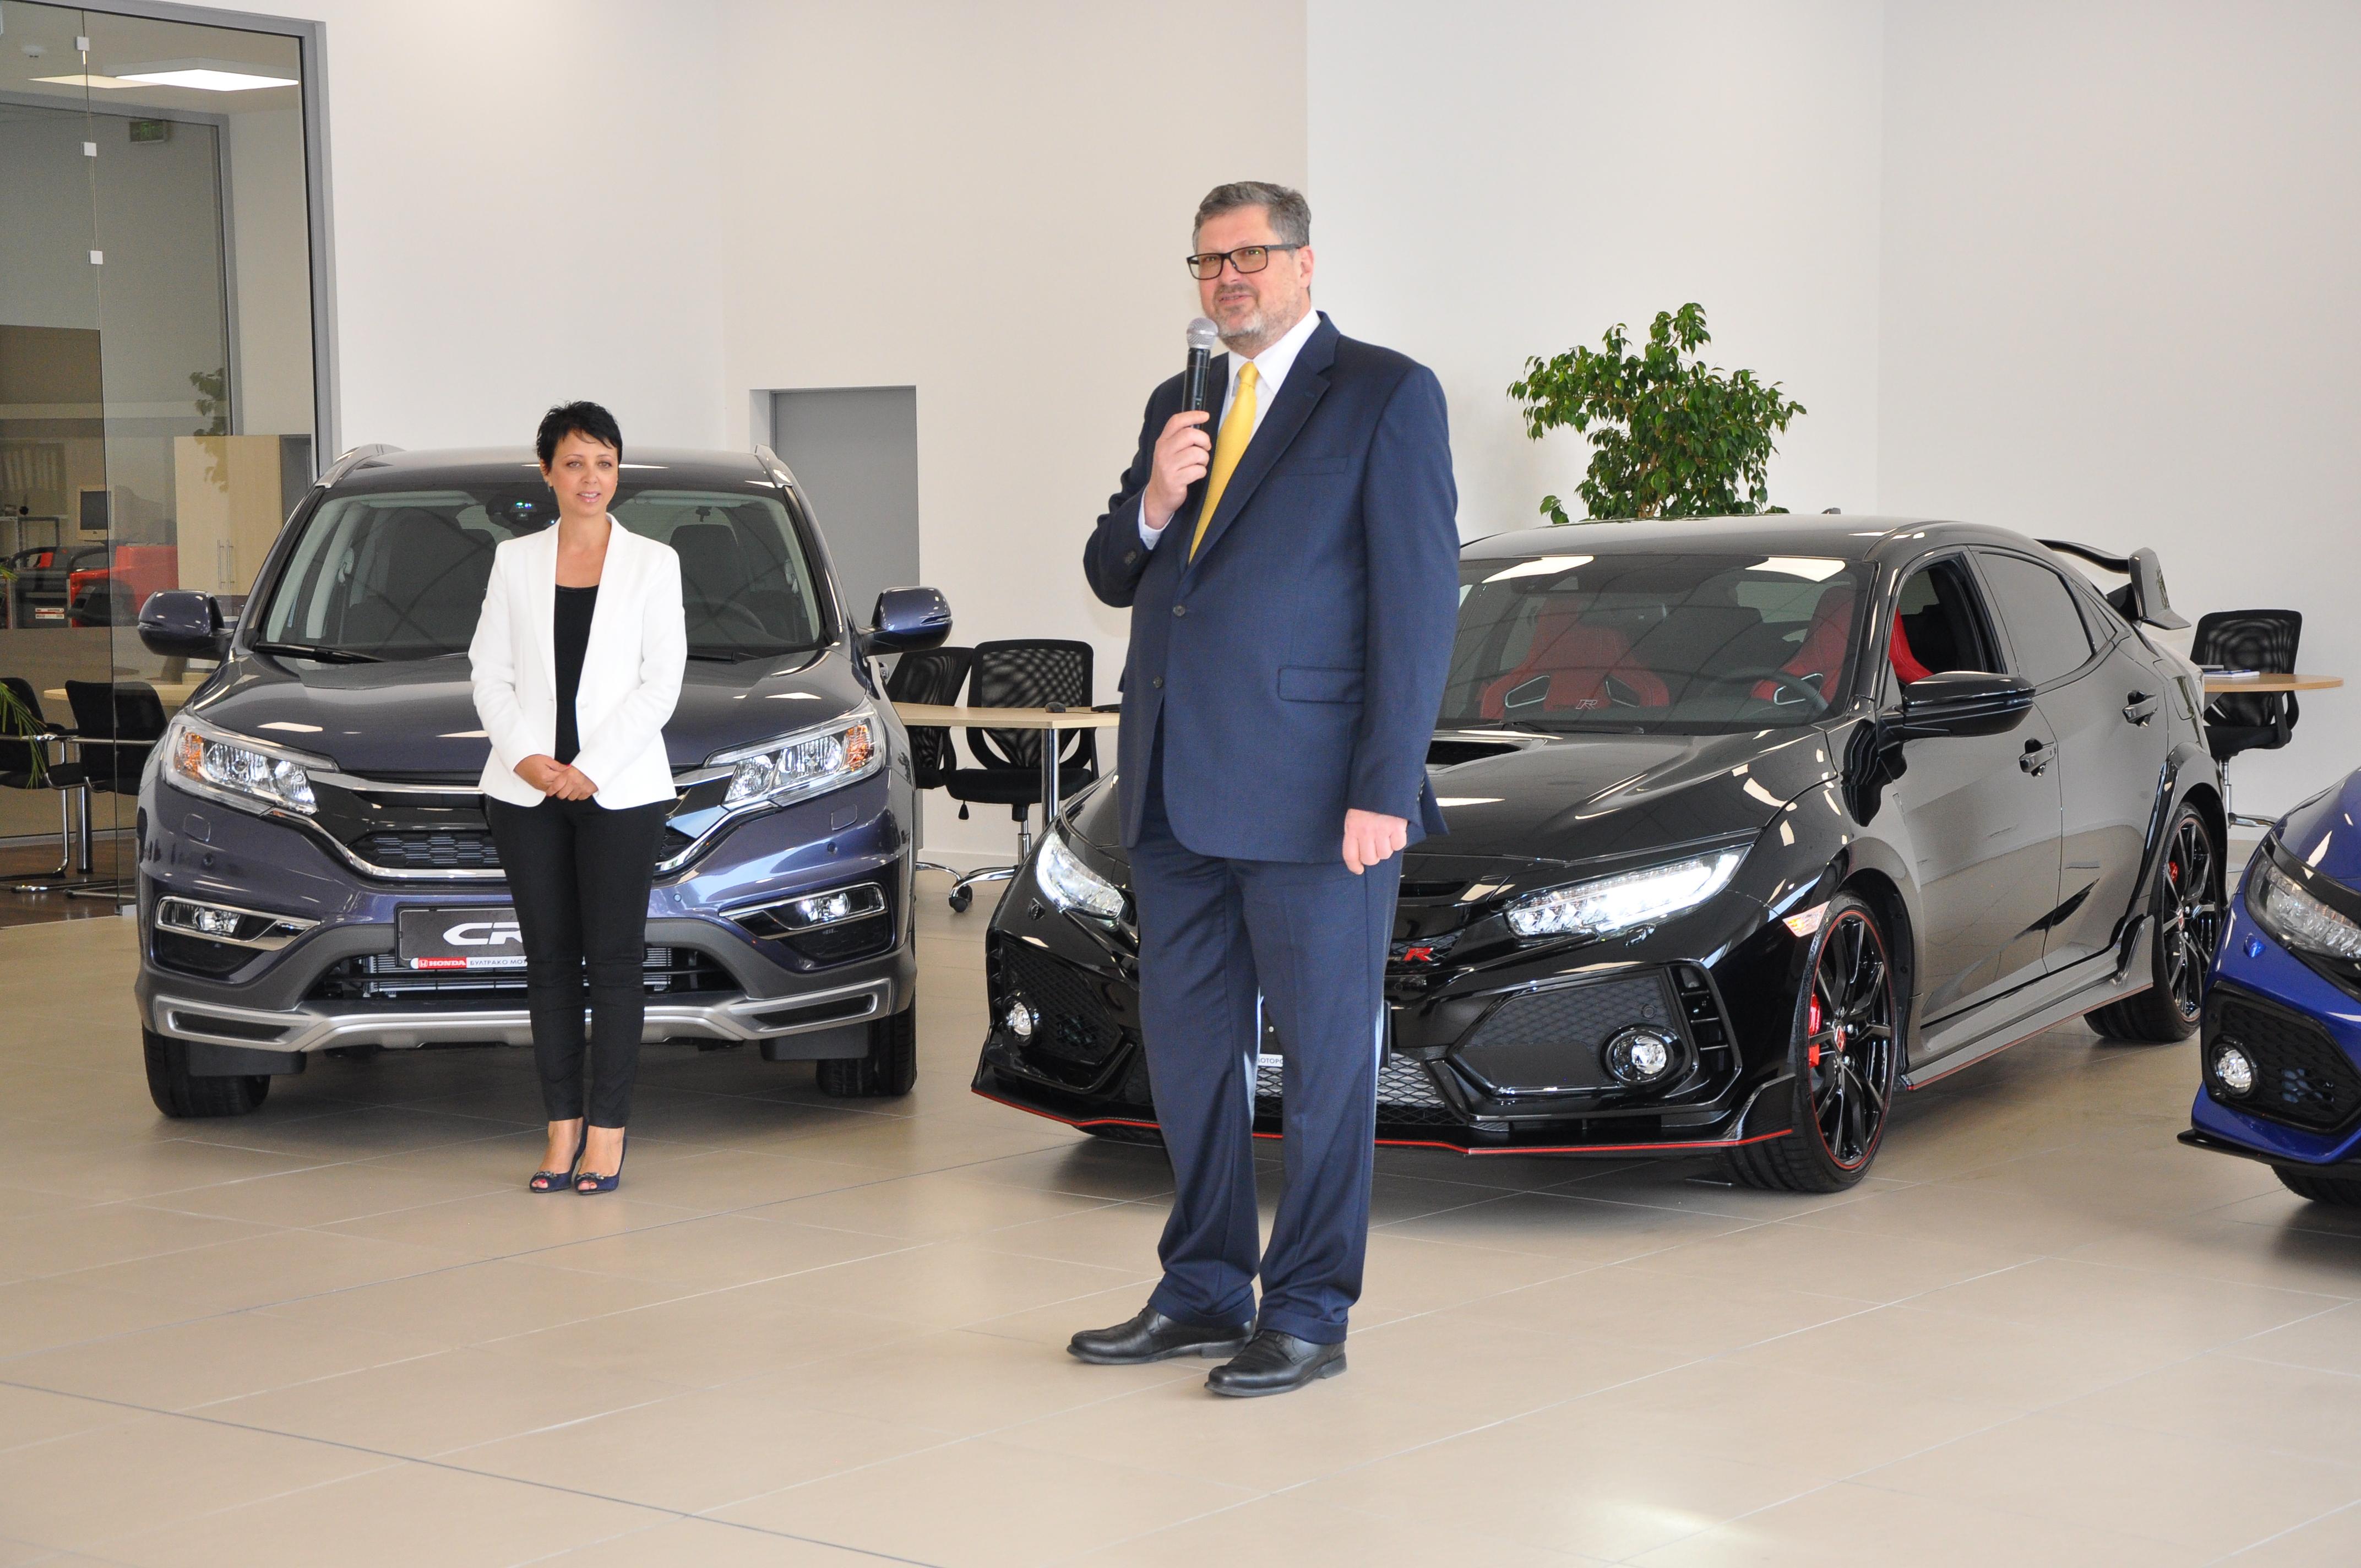 Костадин Грозданов, изп. директор на Бултрако АД, и Ангелина Деведжиева, изп. директор на Бултрако Моторс